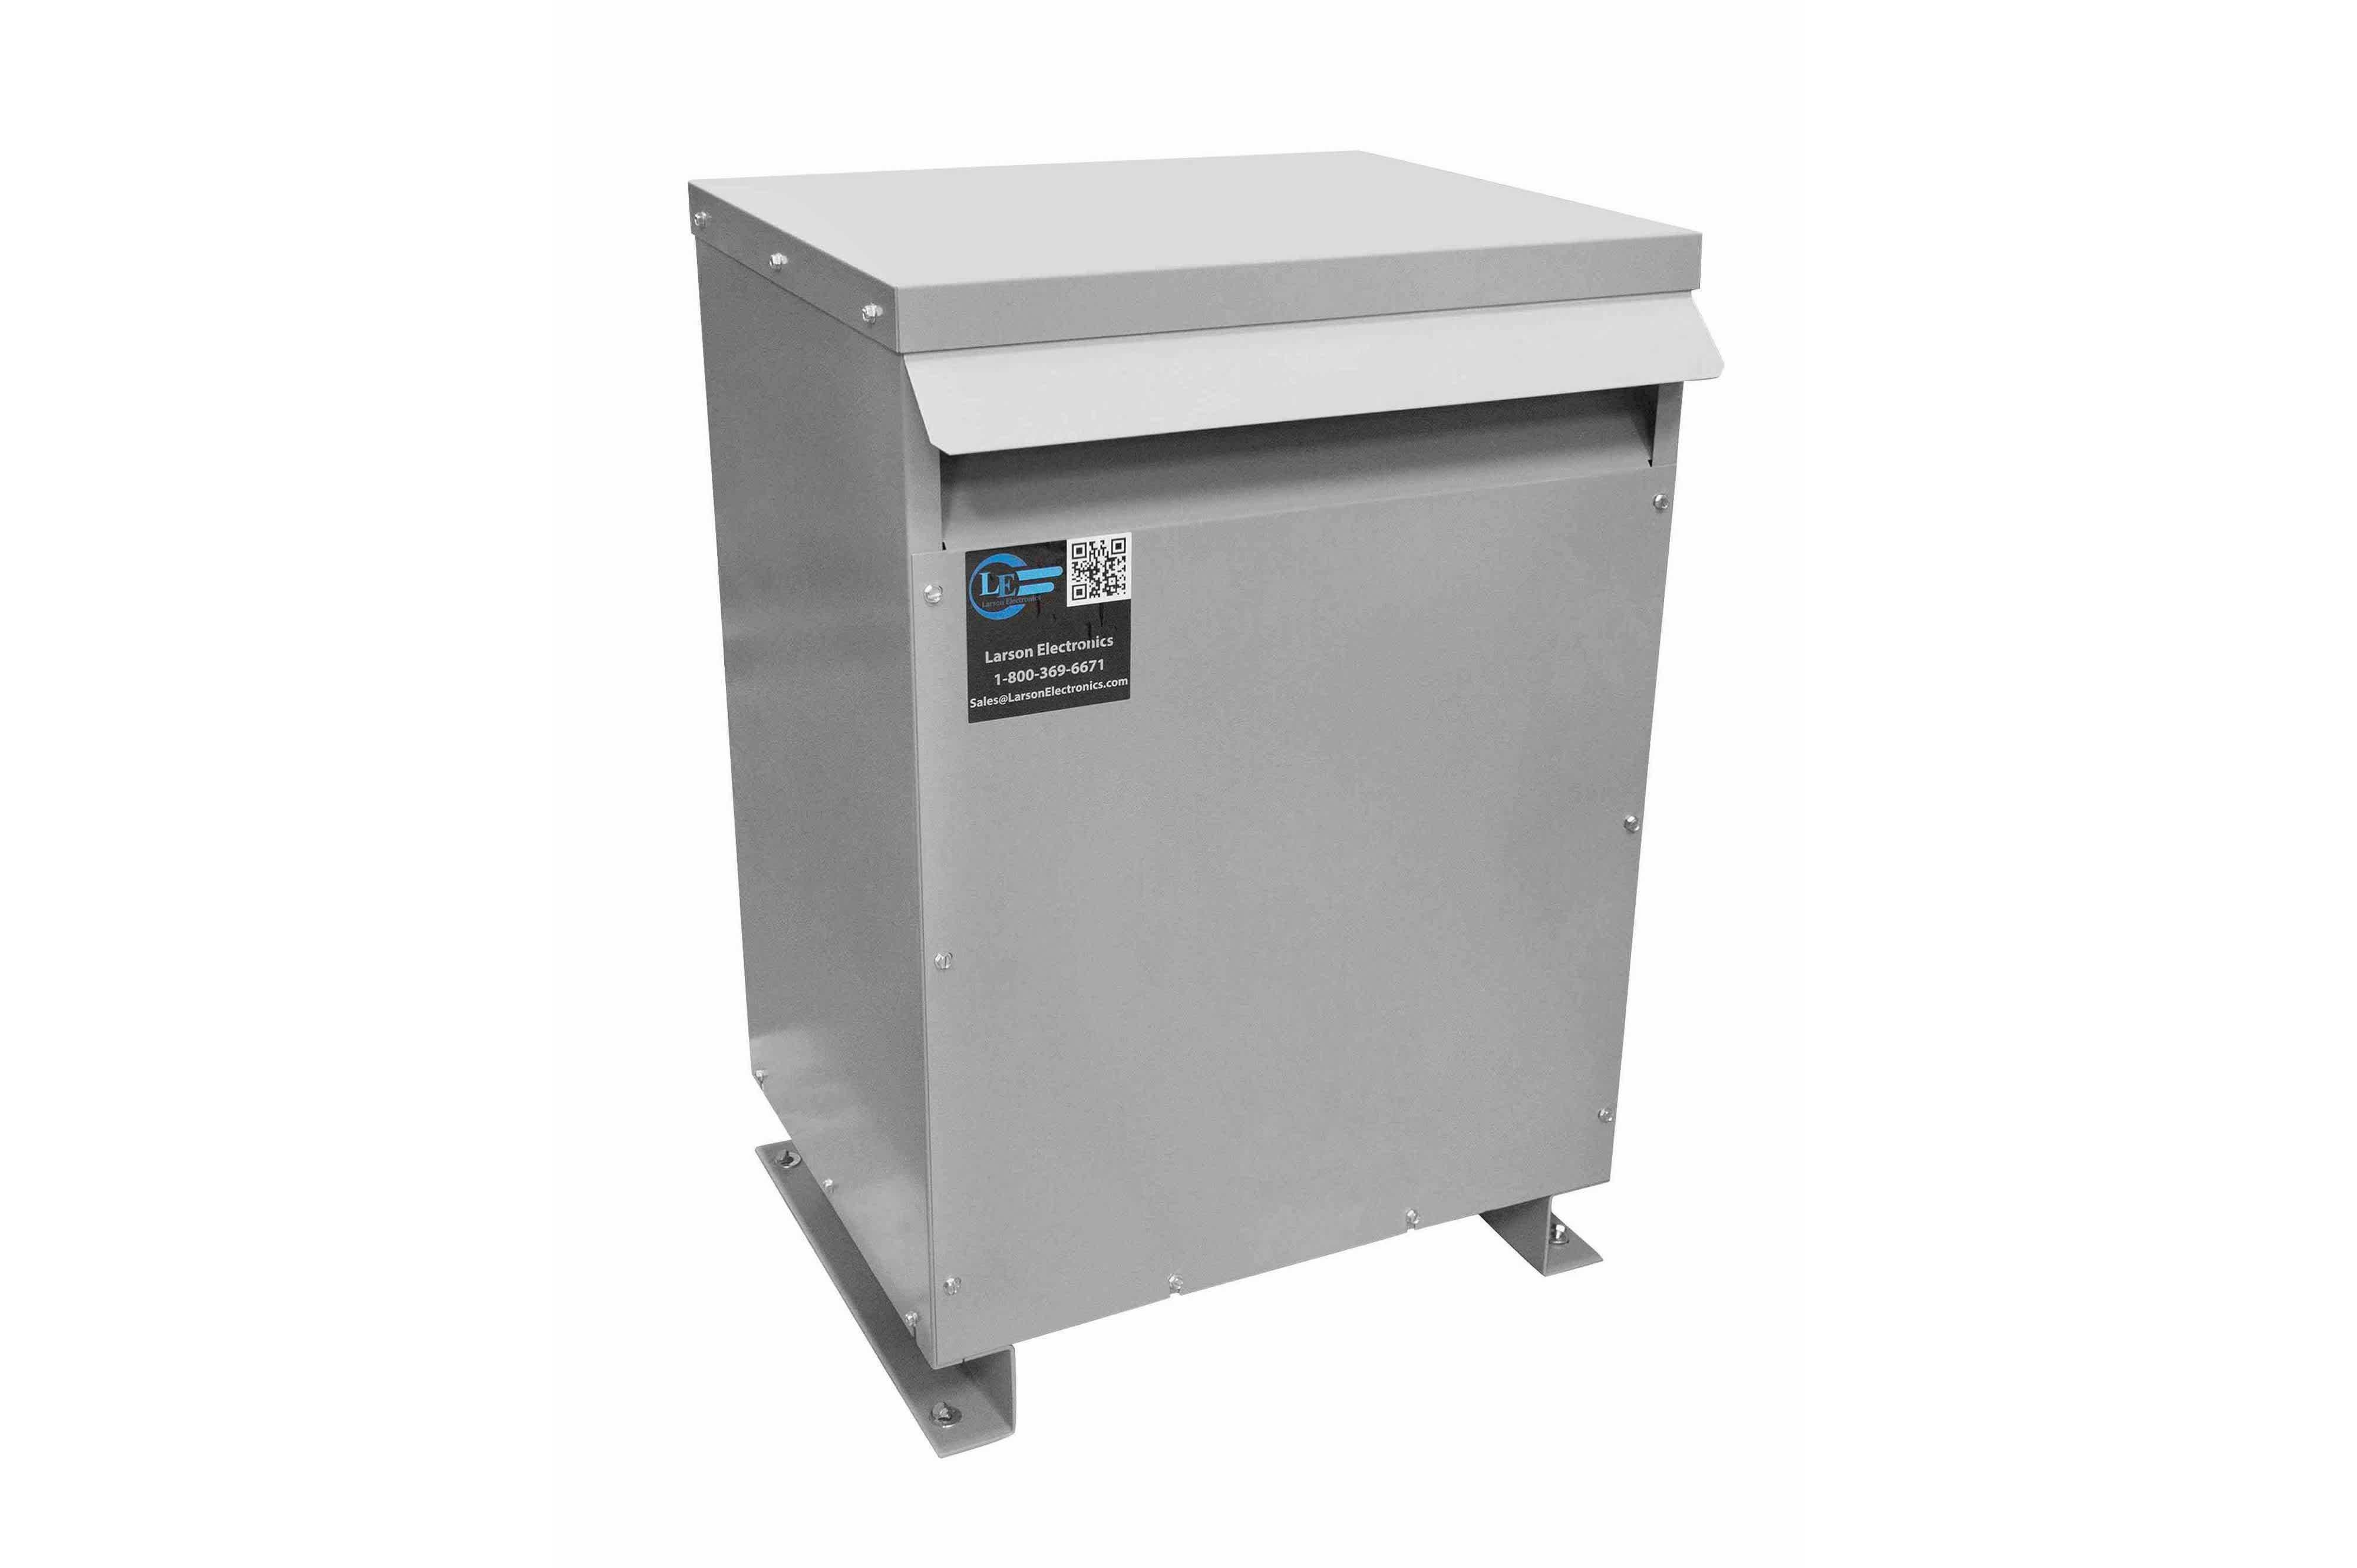 167 kVA 3PH Isolation Transformer, 440V Wye Primary, 208Y/120 Wye-N Secondary, N3R, Ventilated, 60 Hz